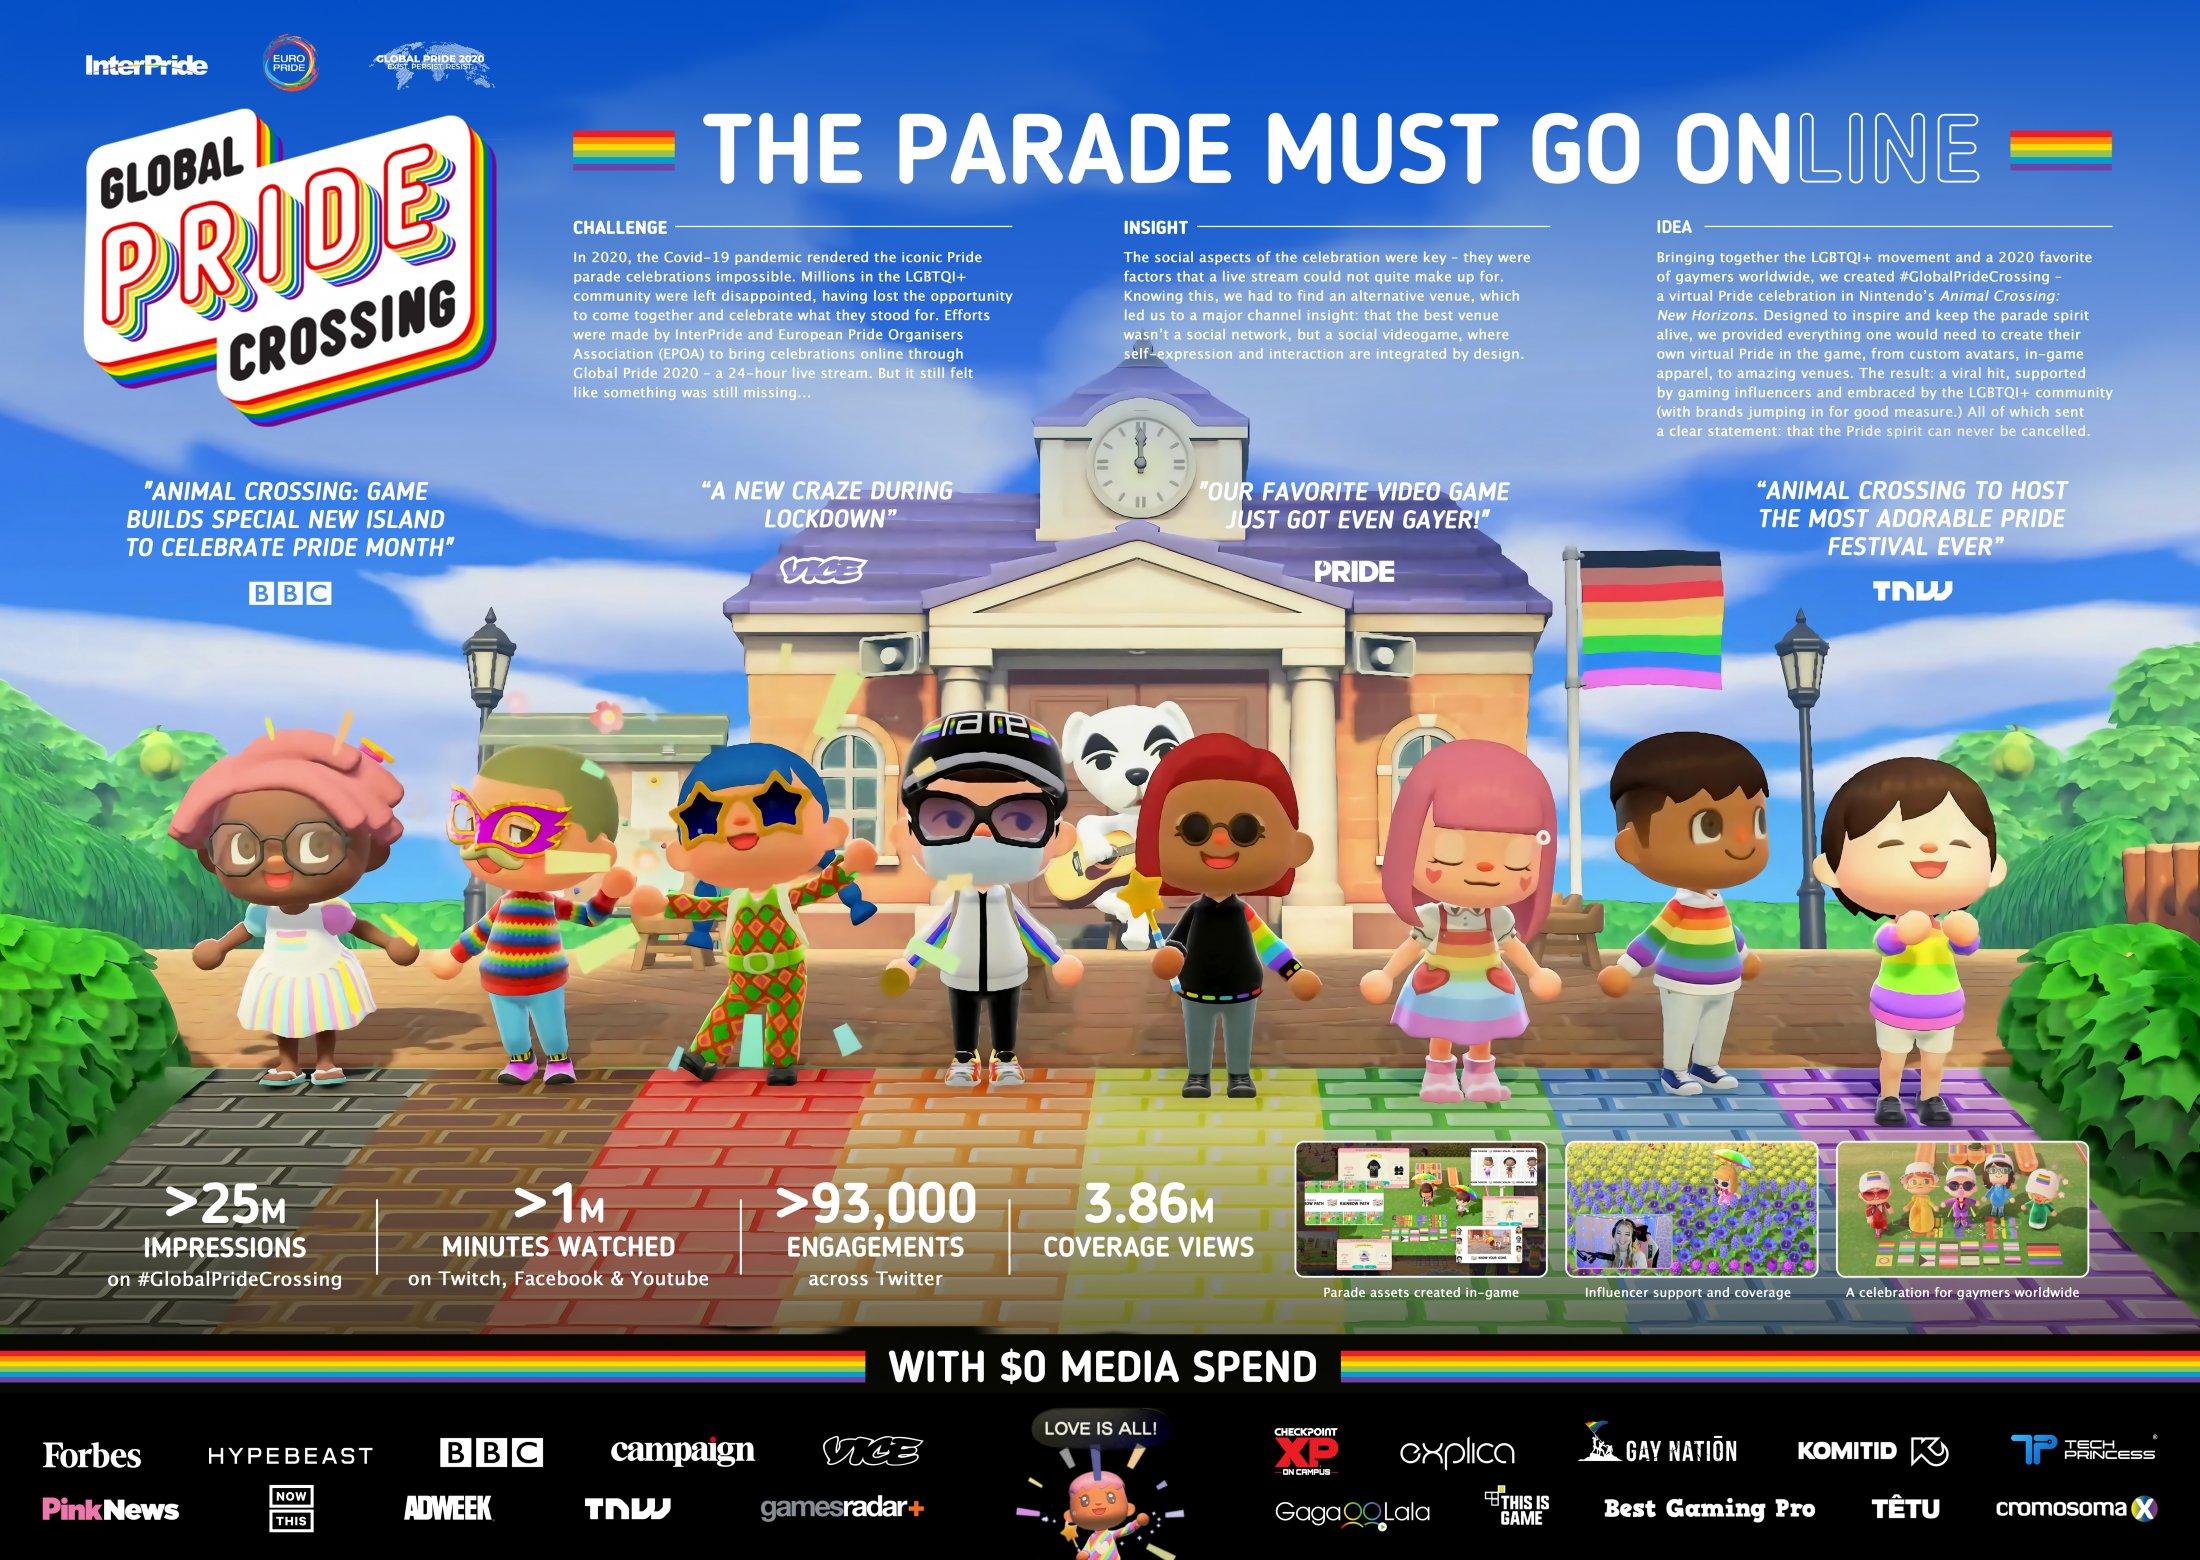 Thumbnail for Global Pride Crossing